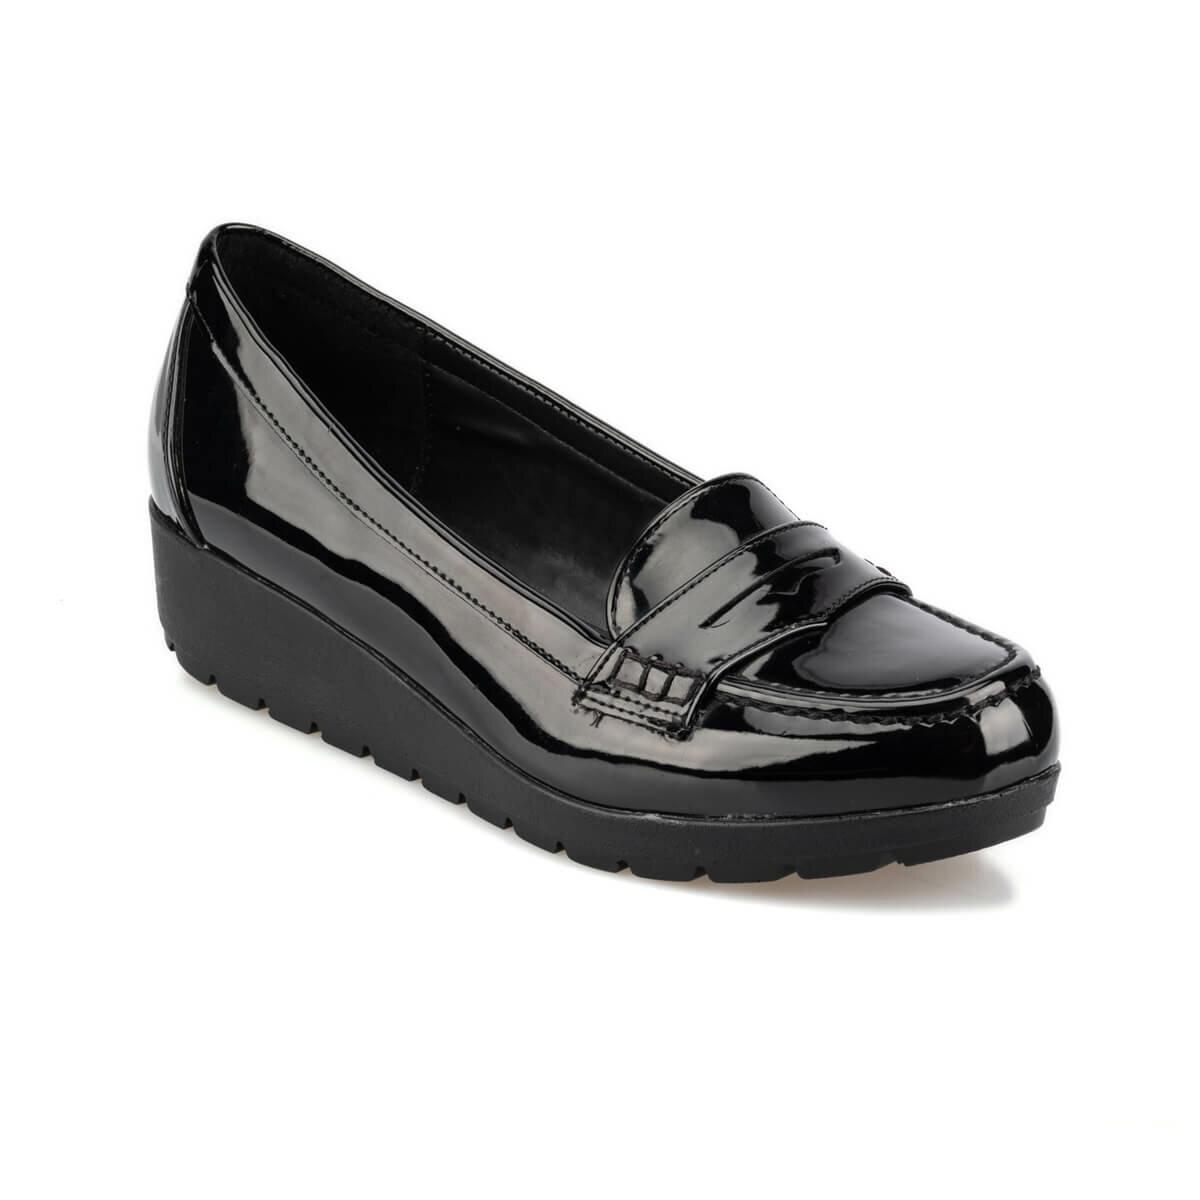 FLO 92.156027.Z Black Women Loafer Shoes Polaris